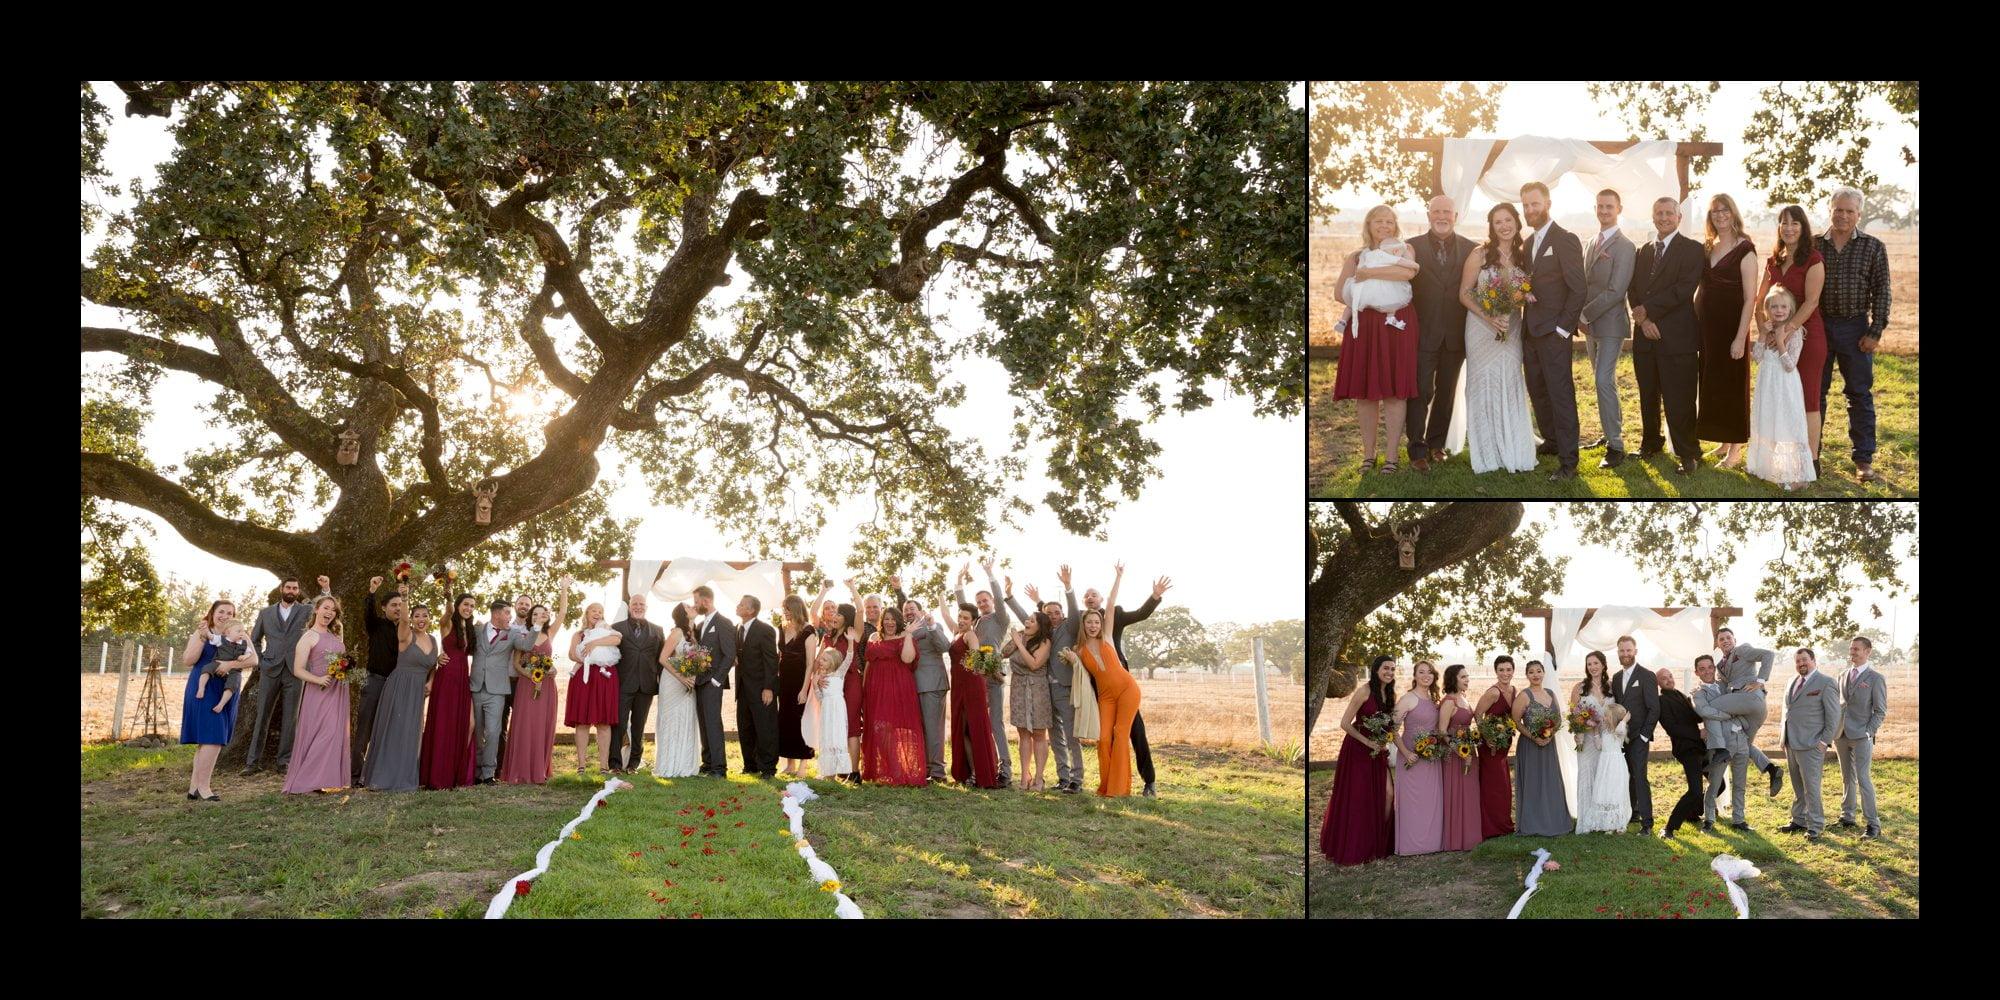 Group photos of bridal party at wedding